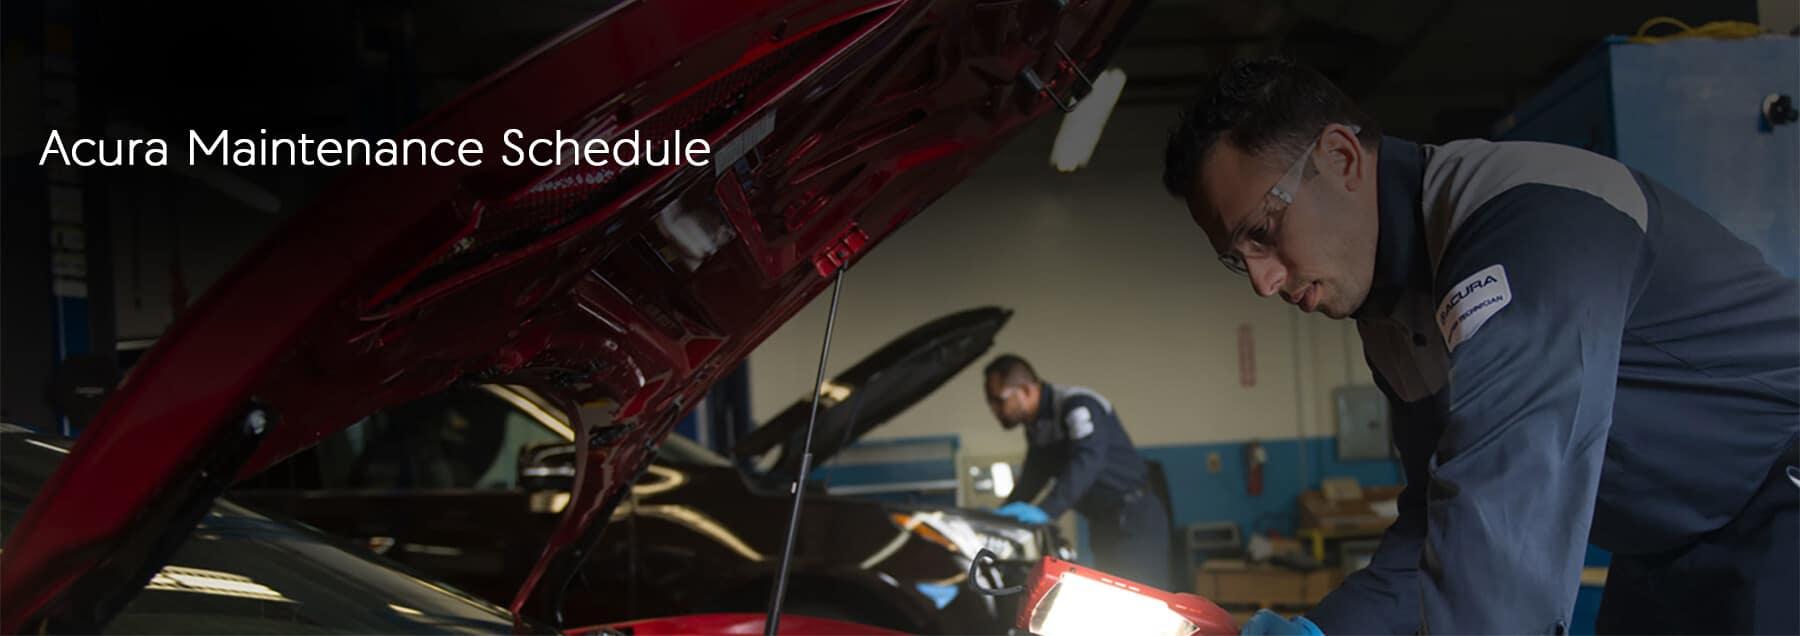 Vern Eide Acura Check Service History Slider